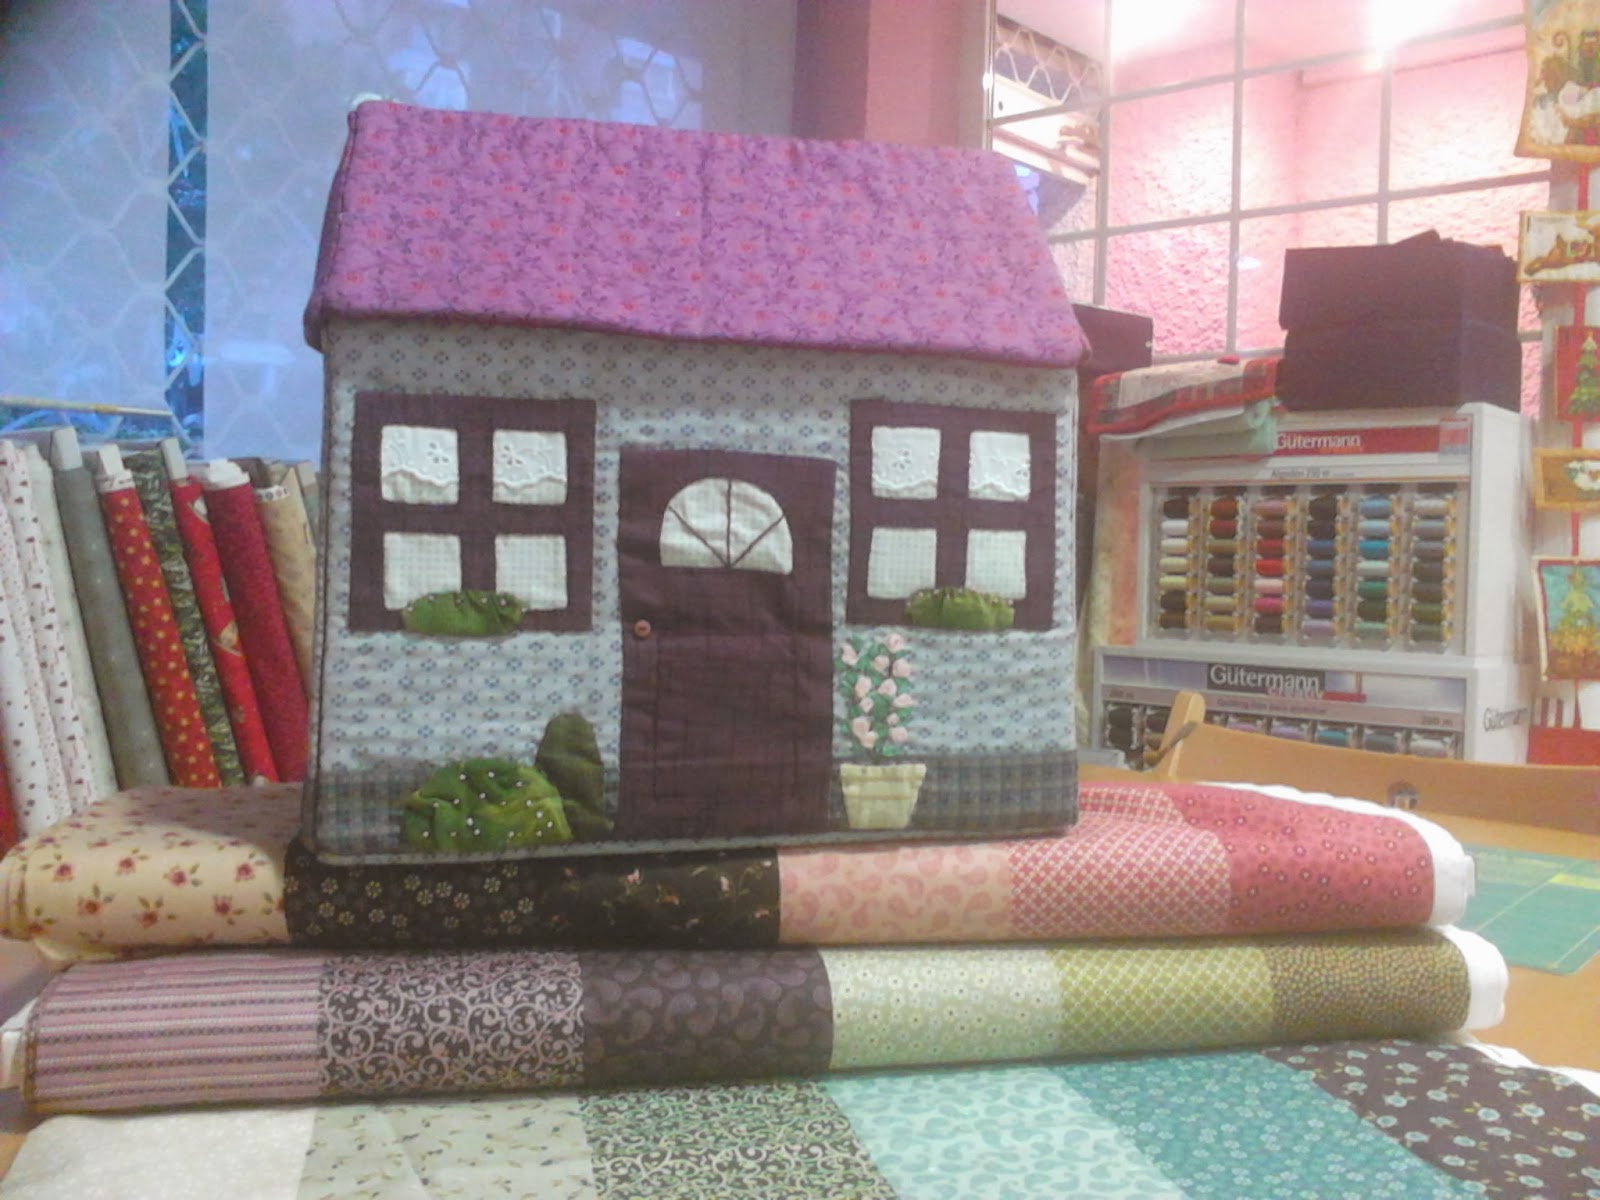 Fraupatchwork y sus ositos casa patchwork caja para - Casas de patchwork ...